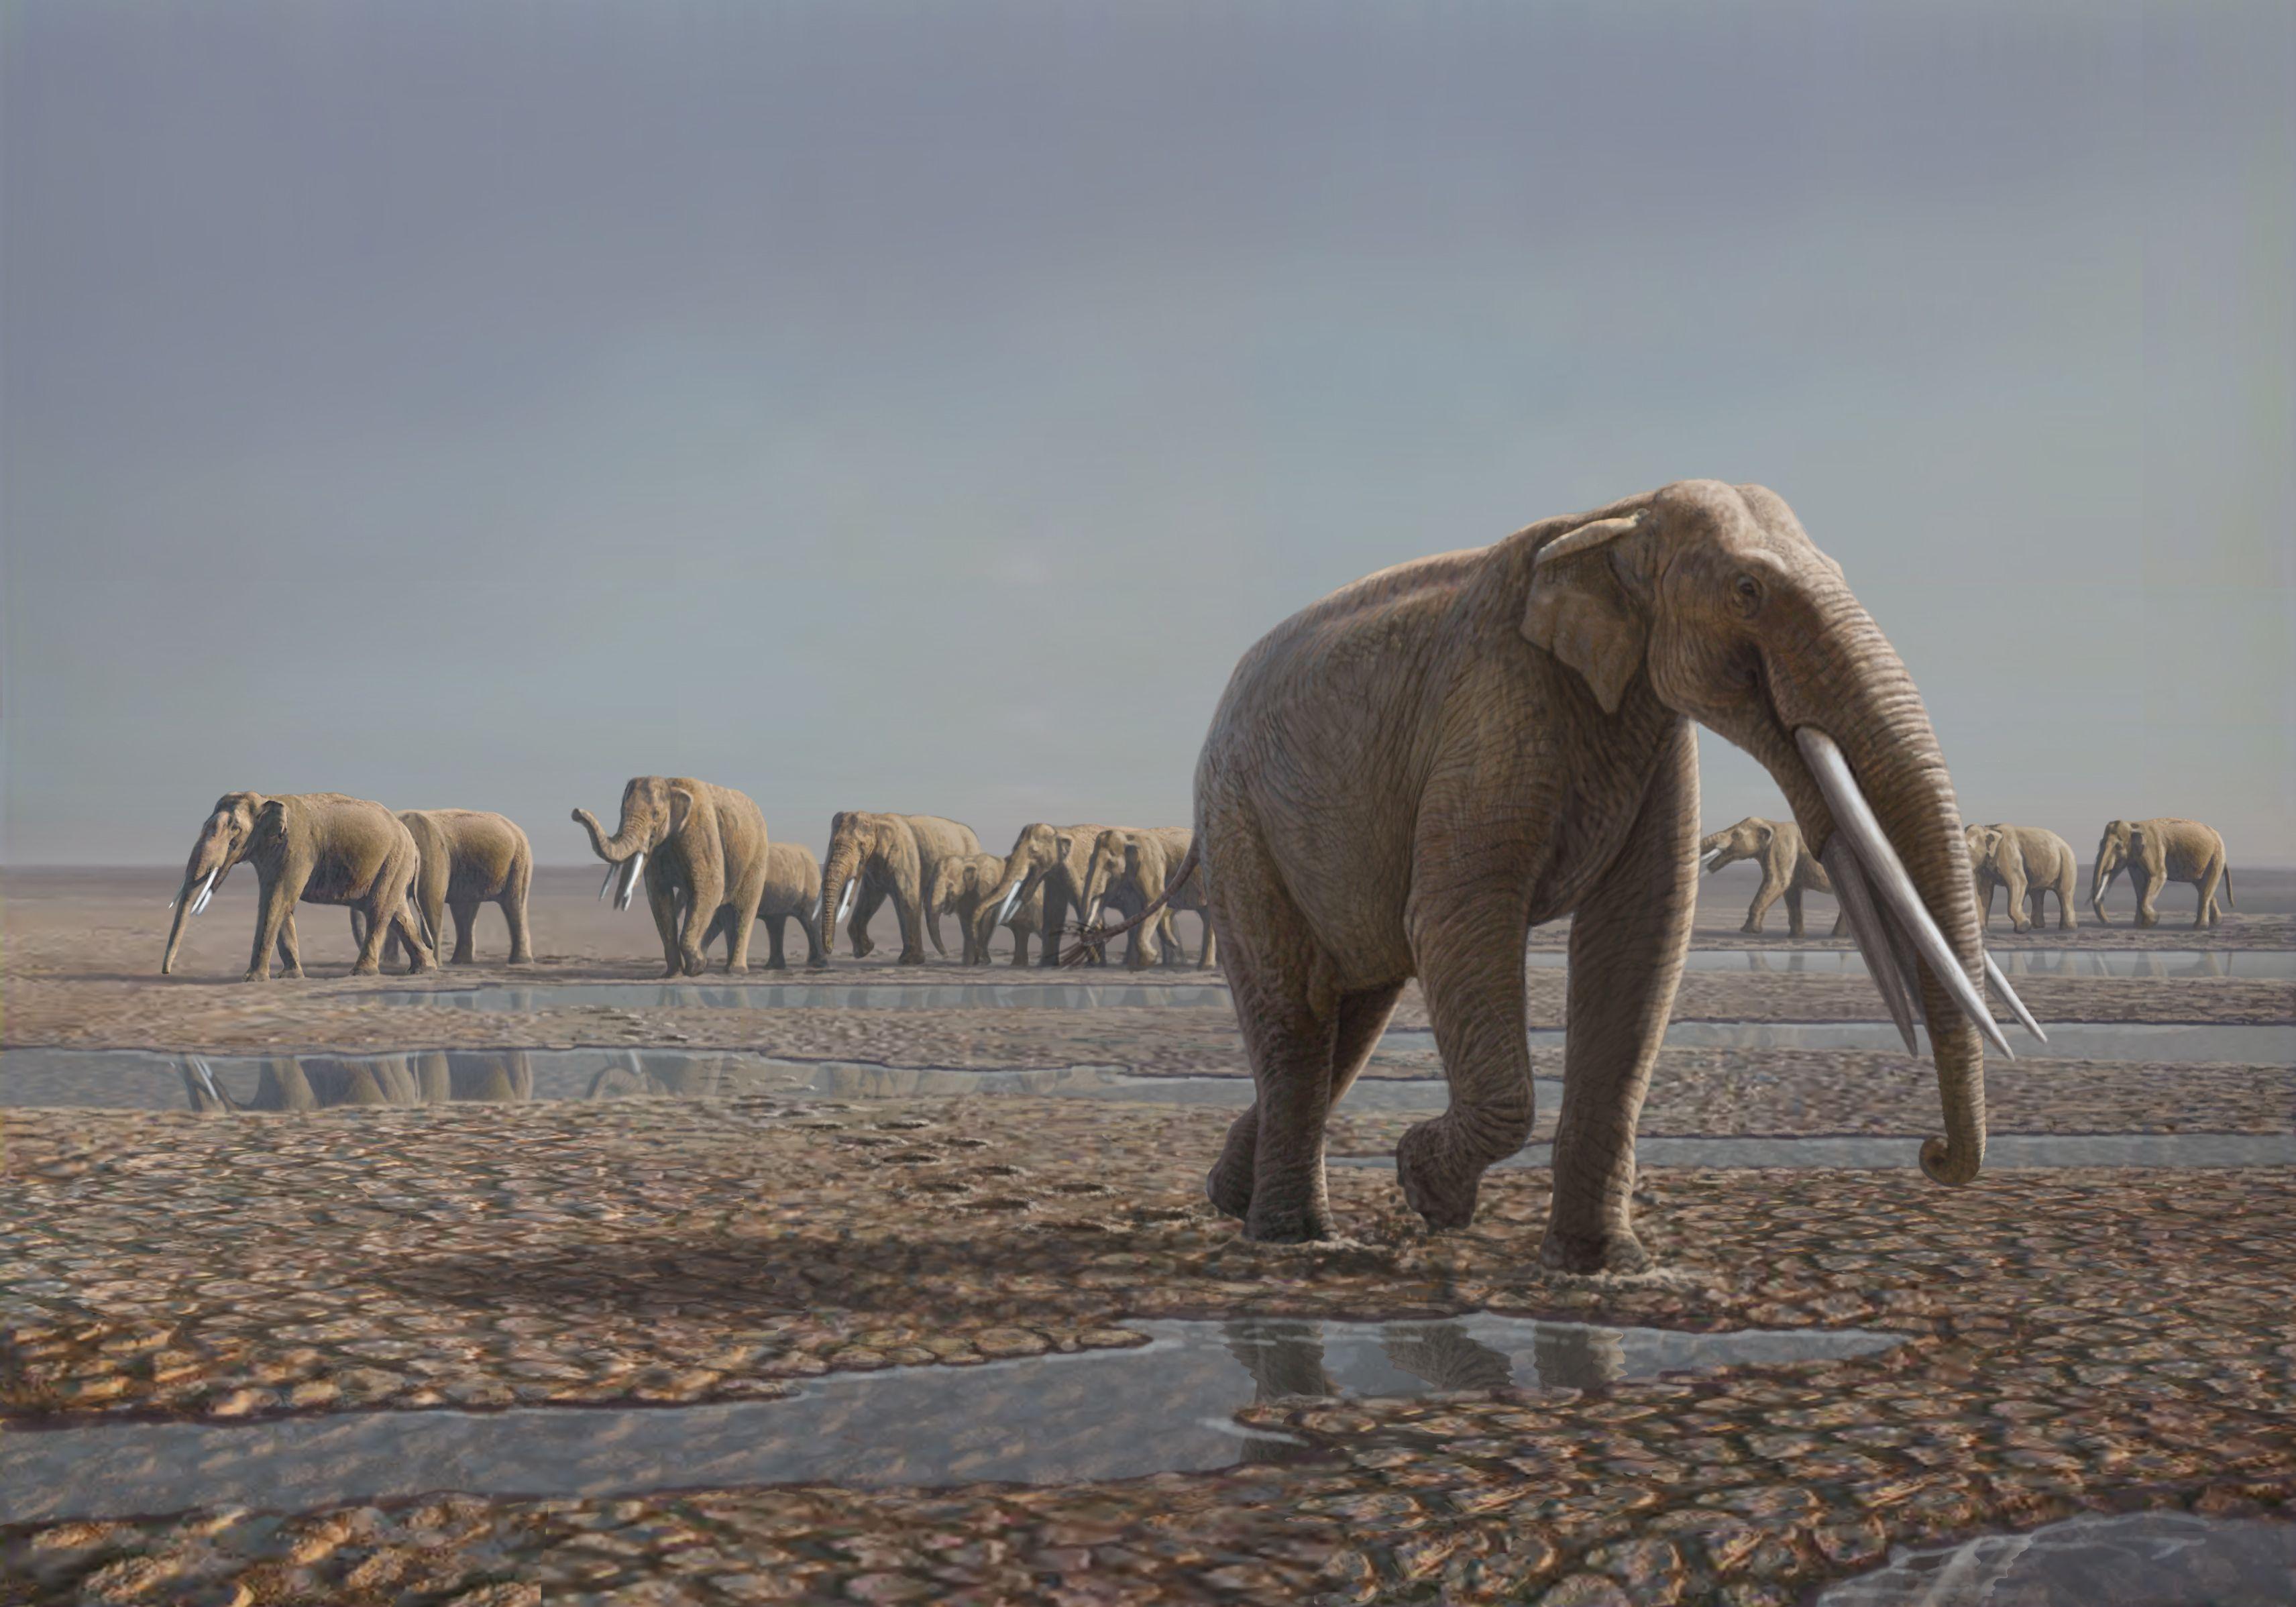 Mammals of the Miocene Era, Artwork Photographic Print by Mauricio ...